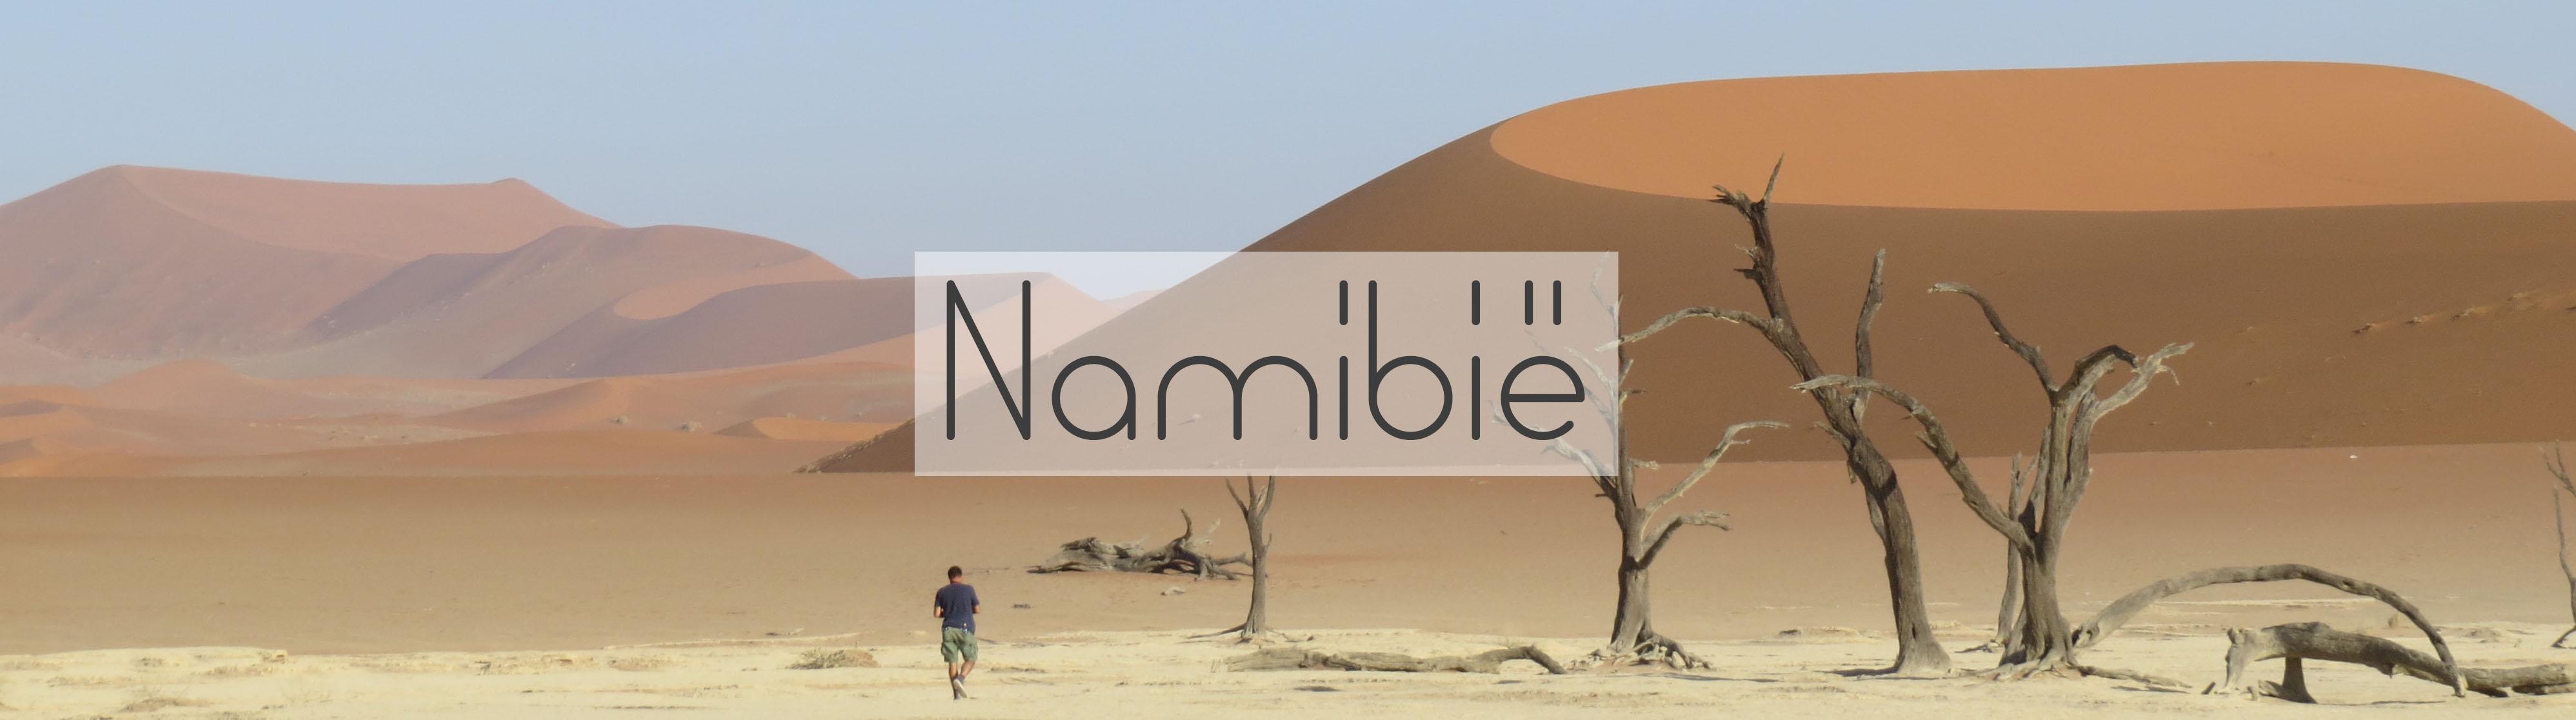 Namibie reisinfo